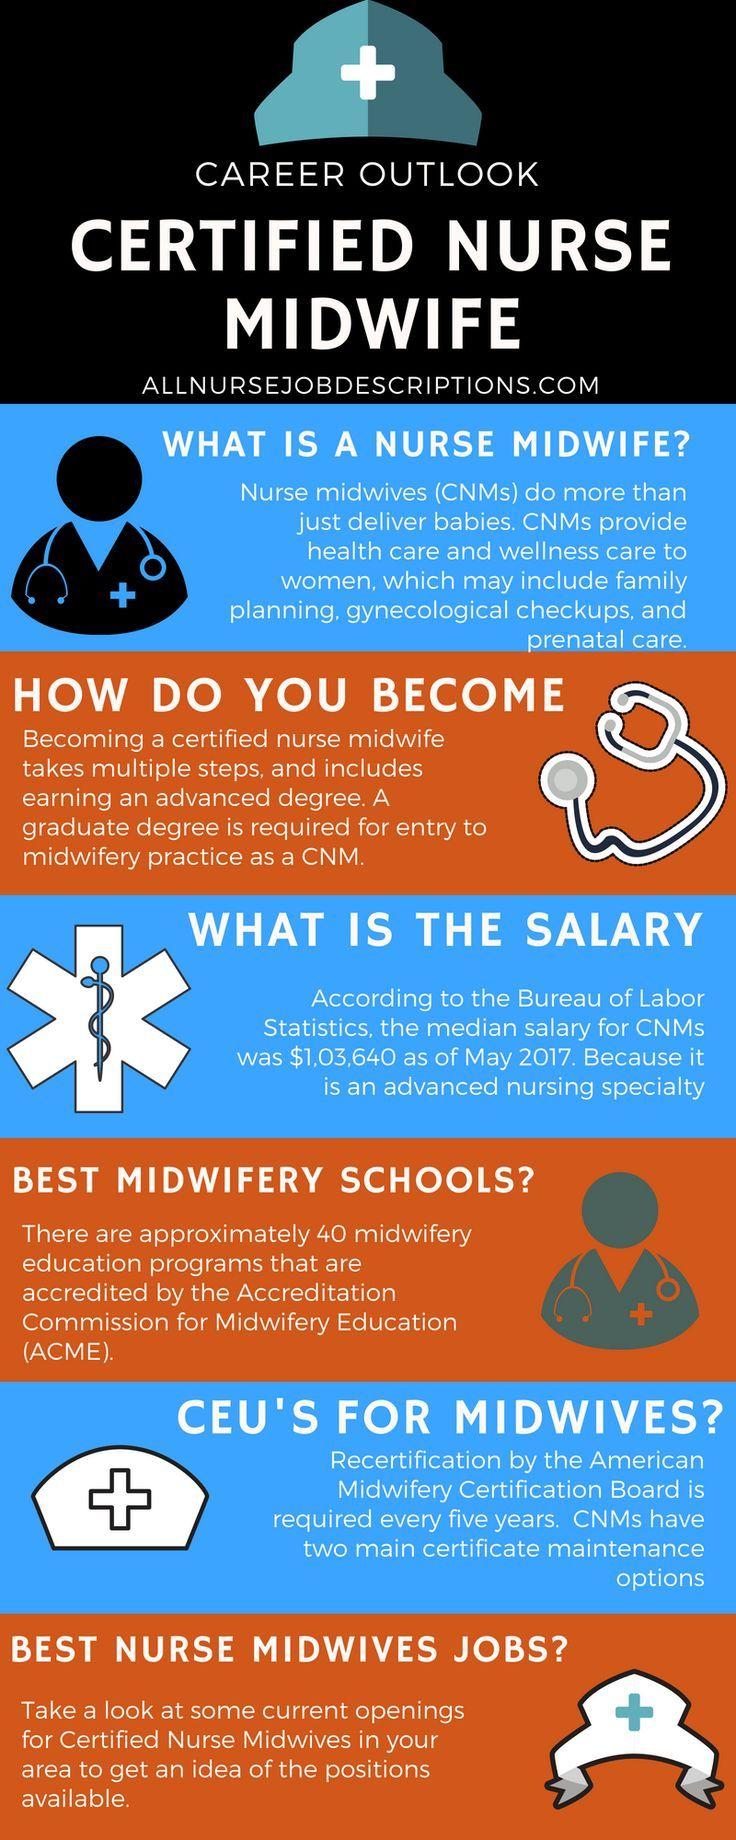 Certified Nurse Midwife (CNM) Salary, Job Description and